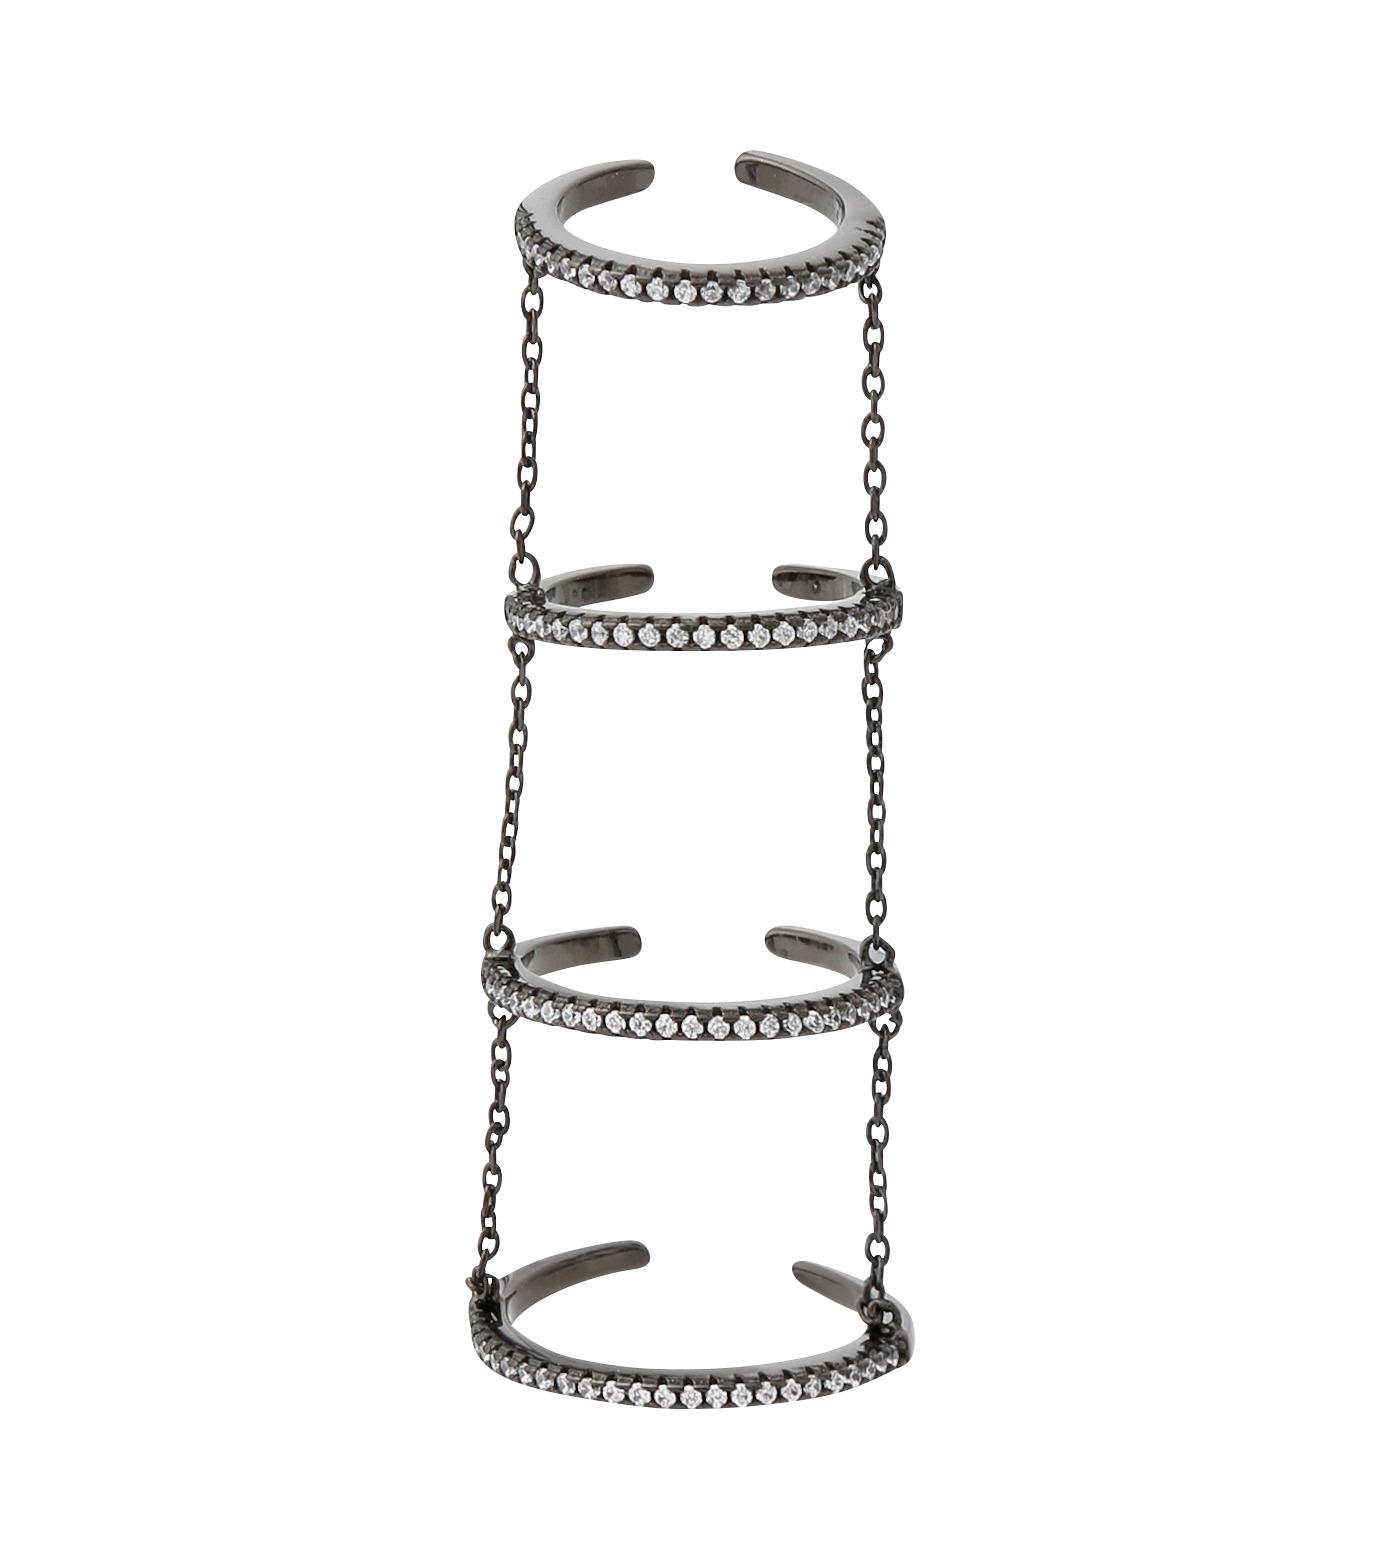 Fallon(ファロン)の4 Tier Pave Slice Rings-GUNMETAL(リング/ring)-FR11515-6 拡大詳細画像1